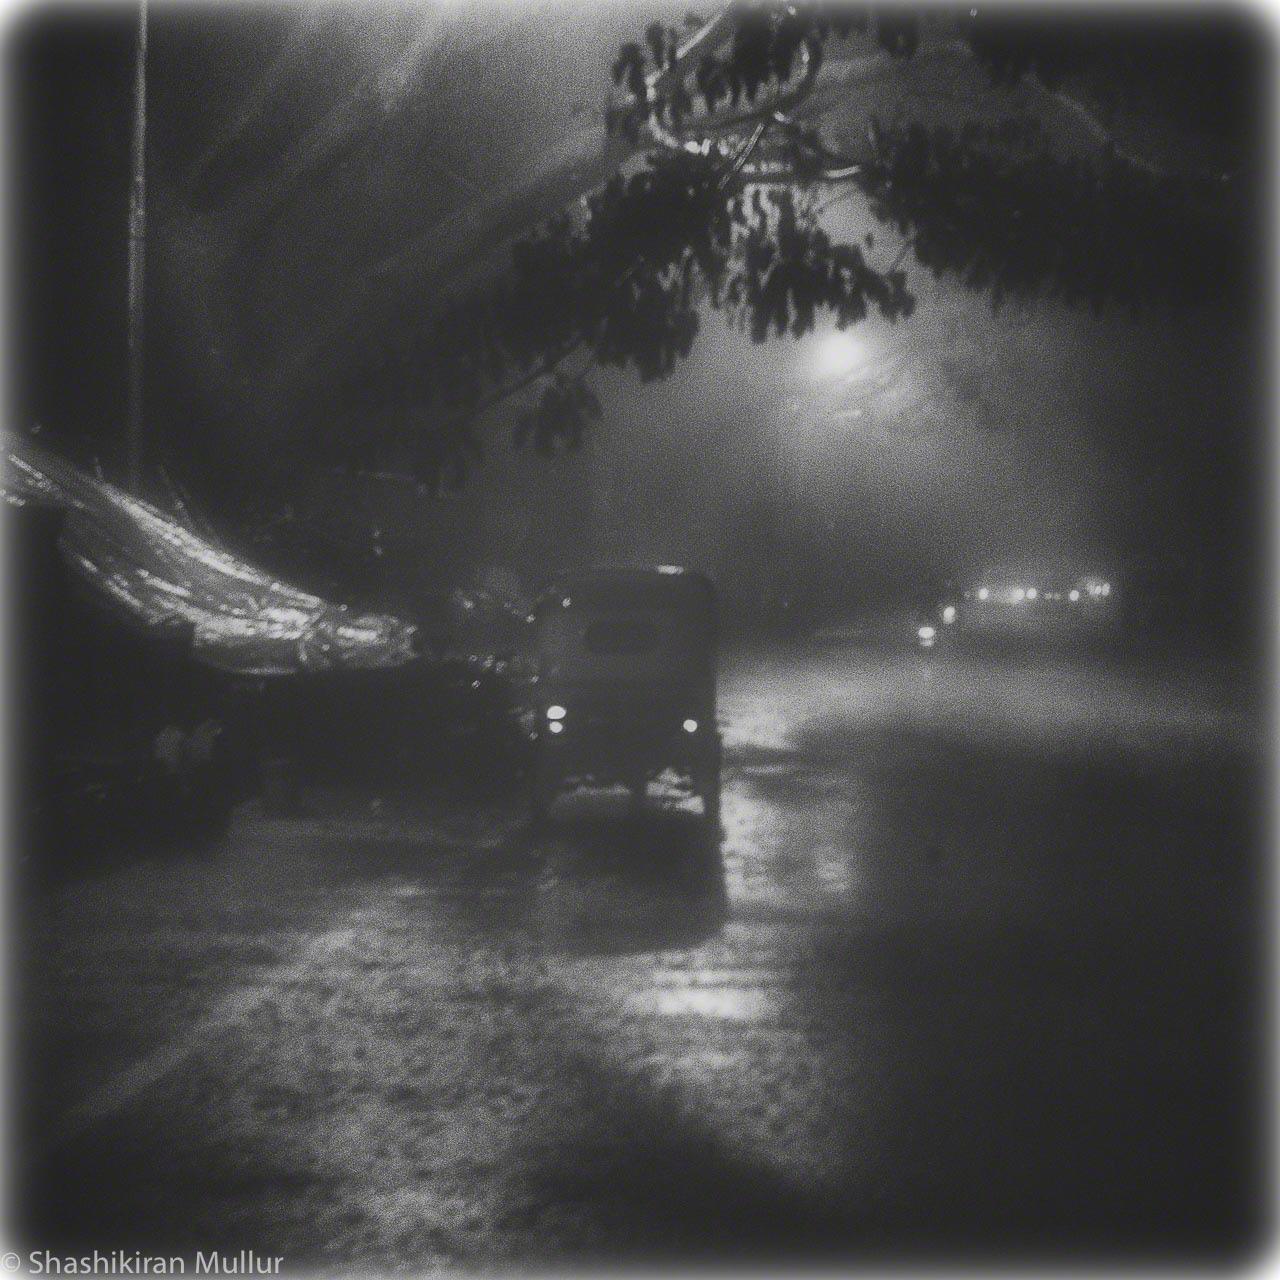 140925-bangalore-194733-Edit-instagram-2.jpg